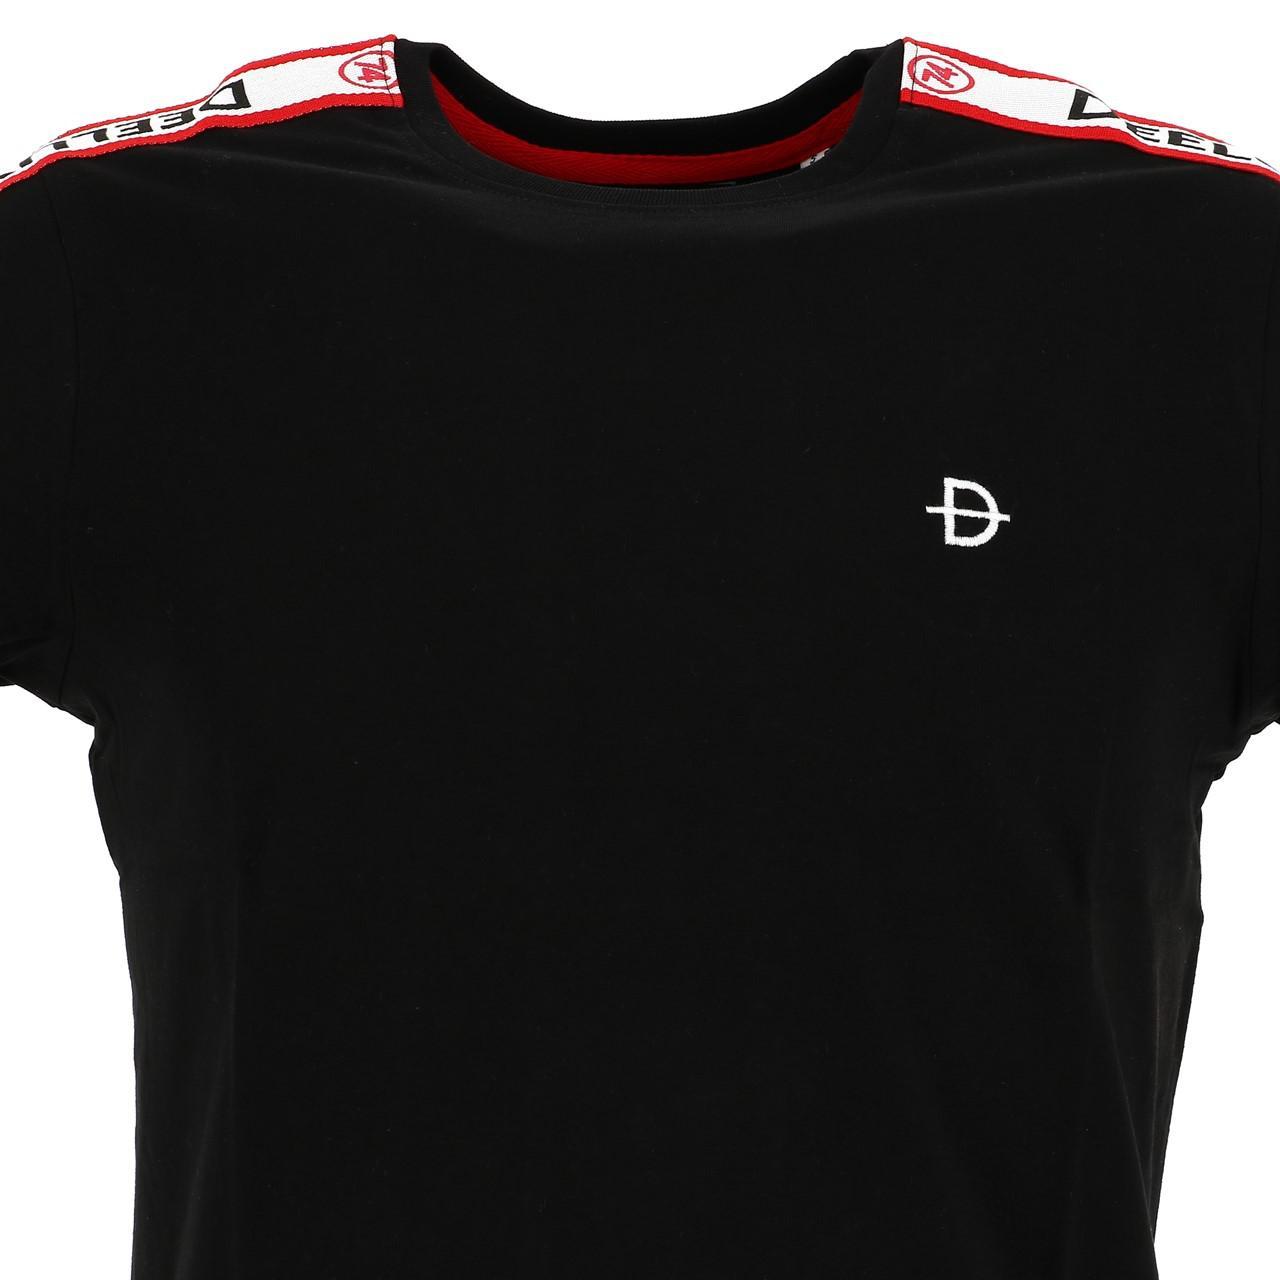 Short-Deeluxe-Bando-Black-Mc-Tee-Black-17843-New thumbnail 2